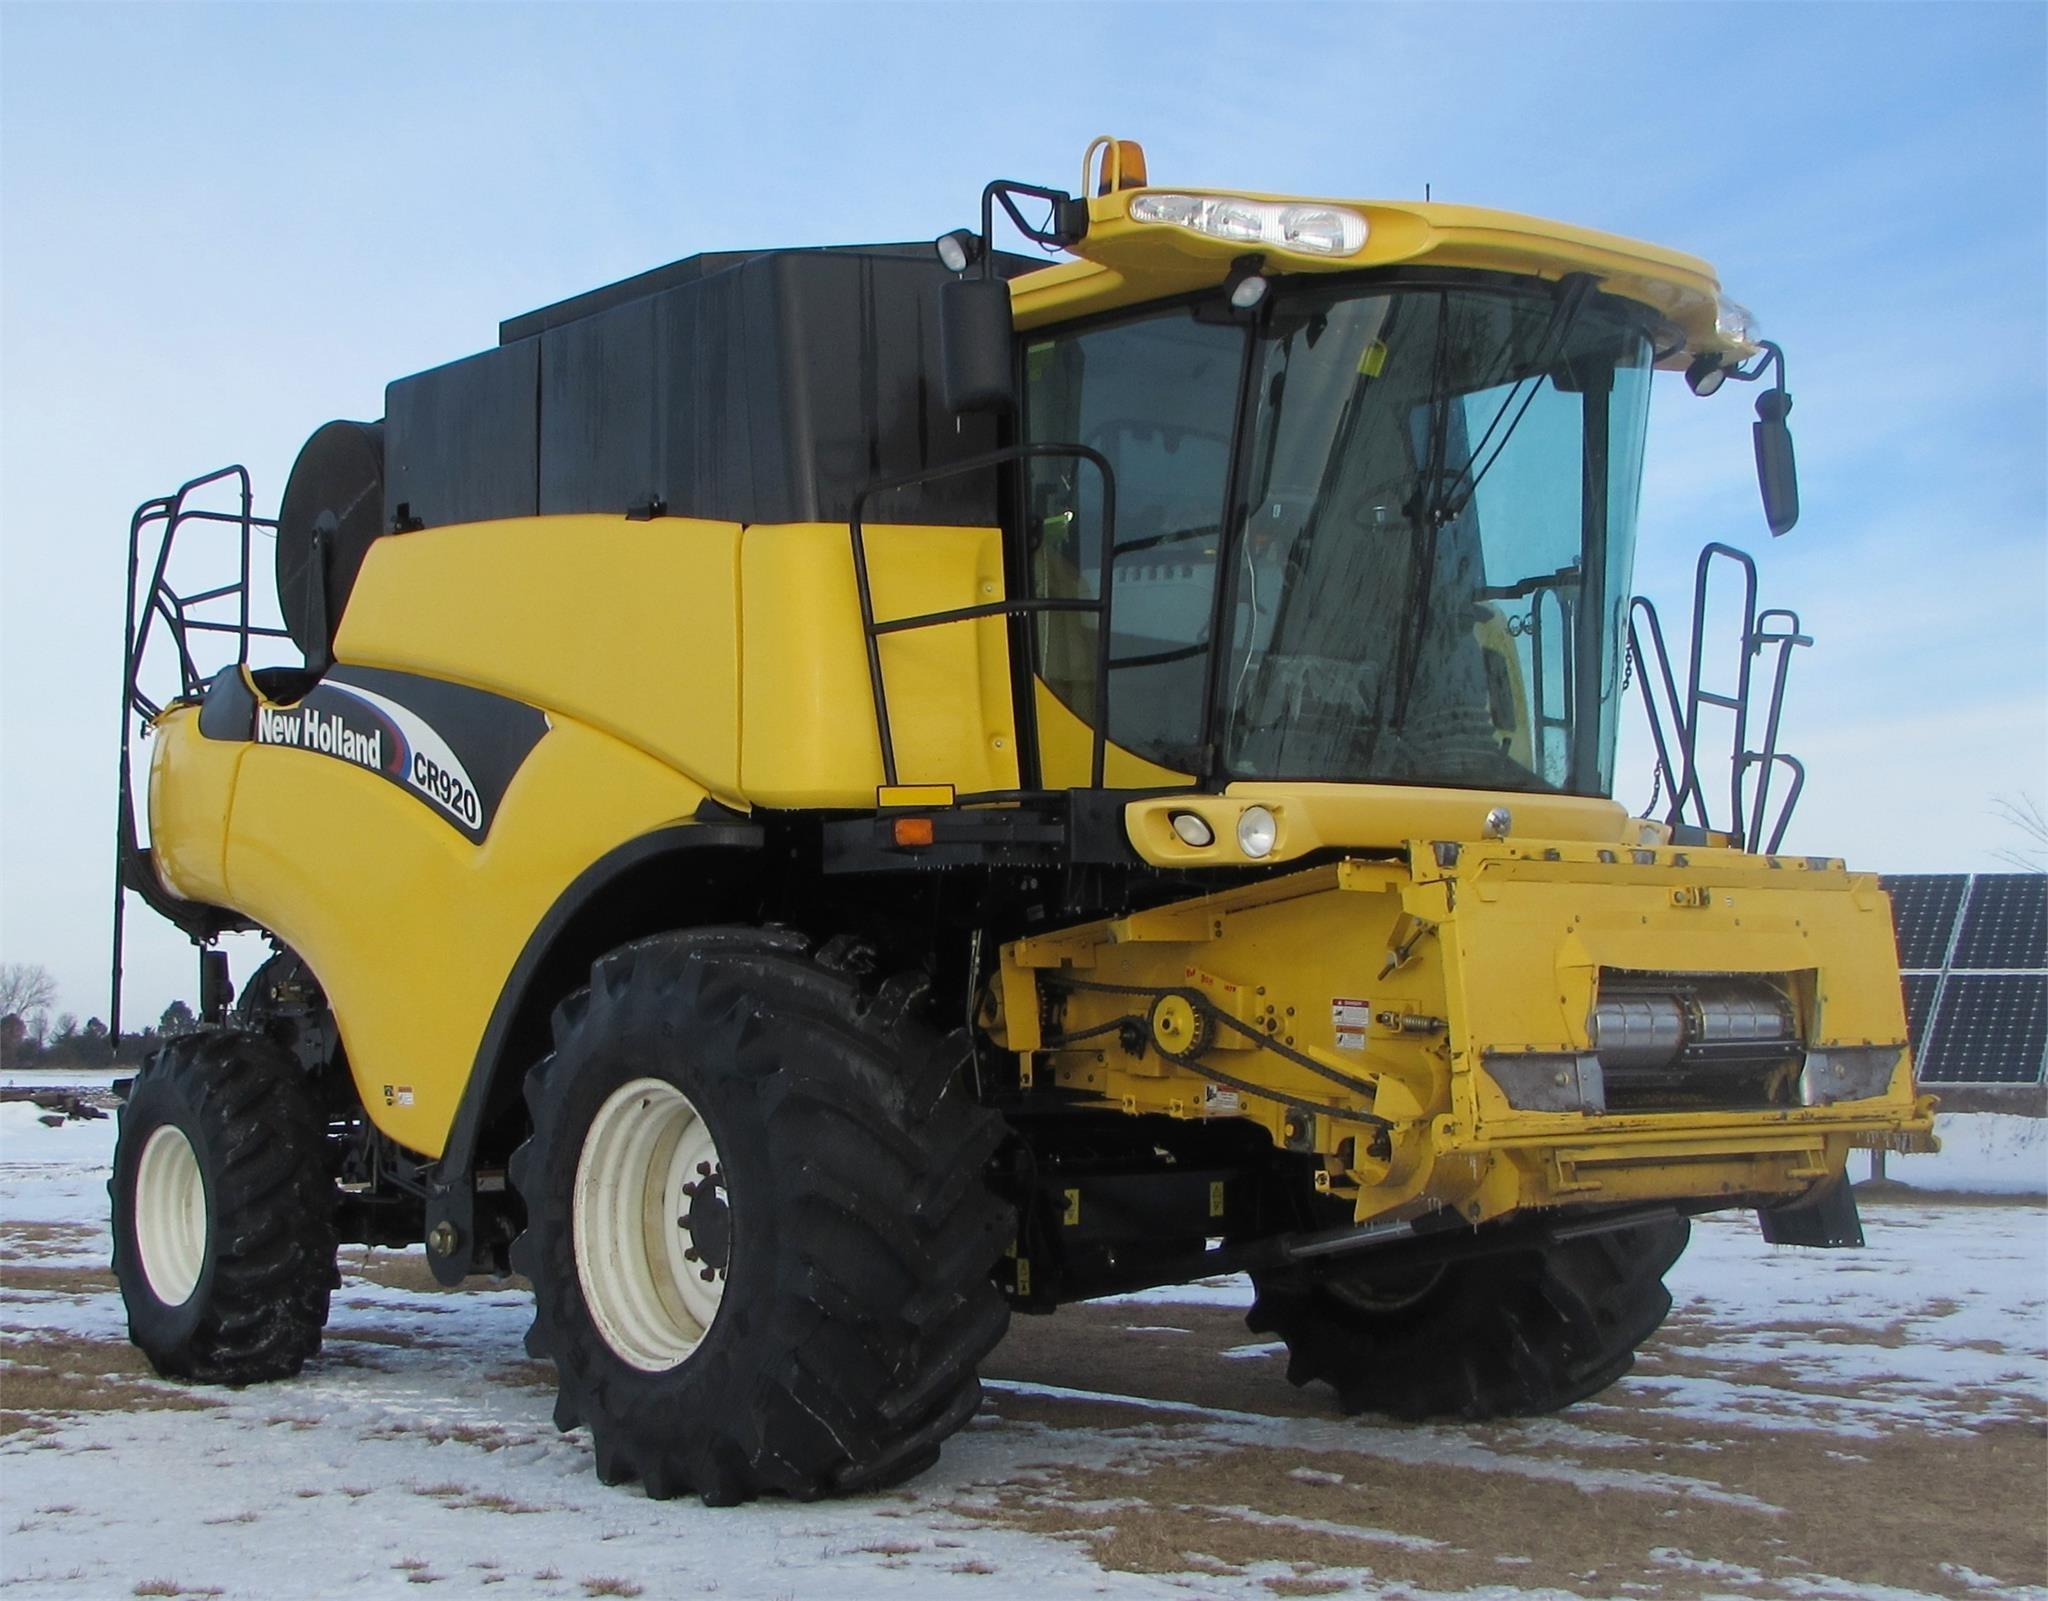 2003 New Holland CR920 Combine